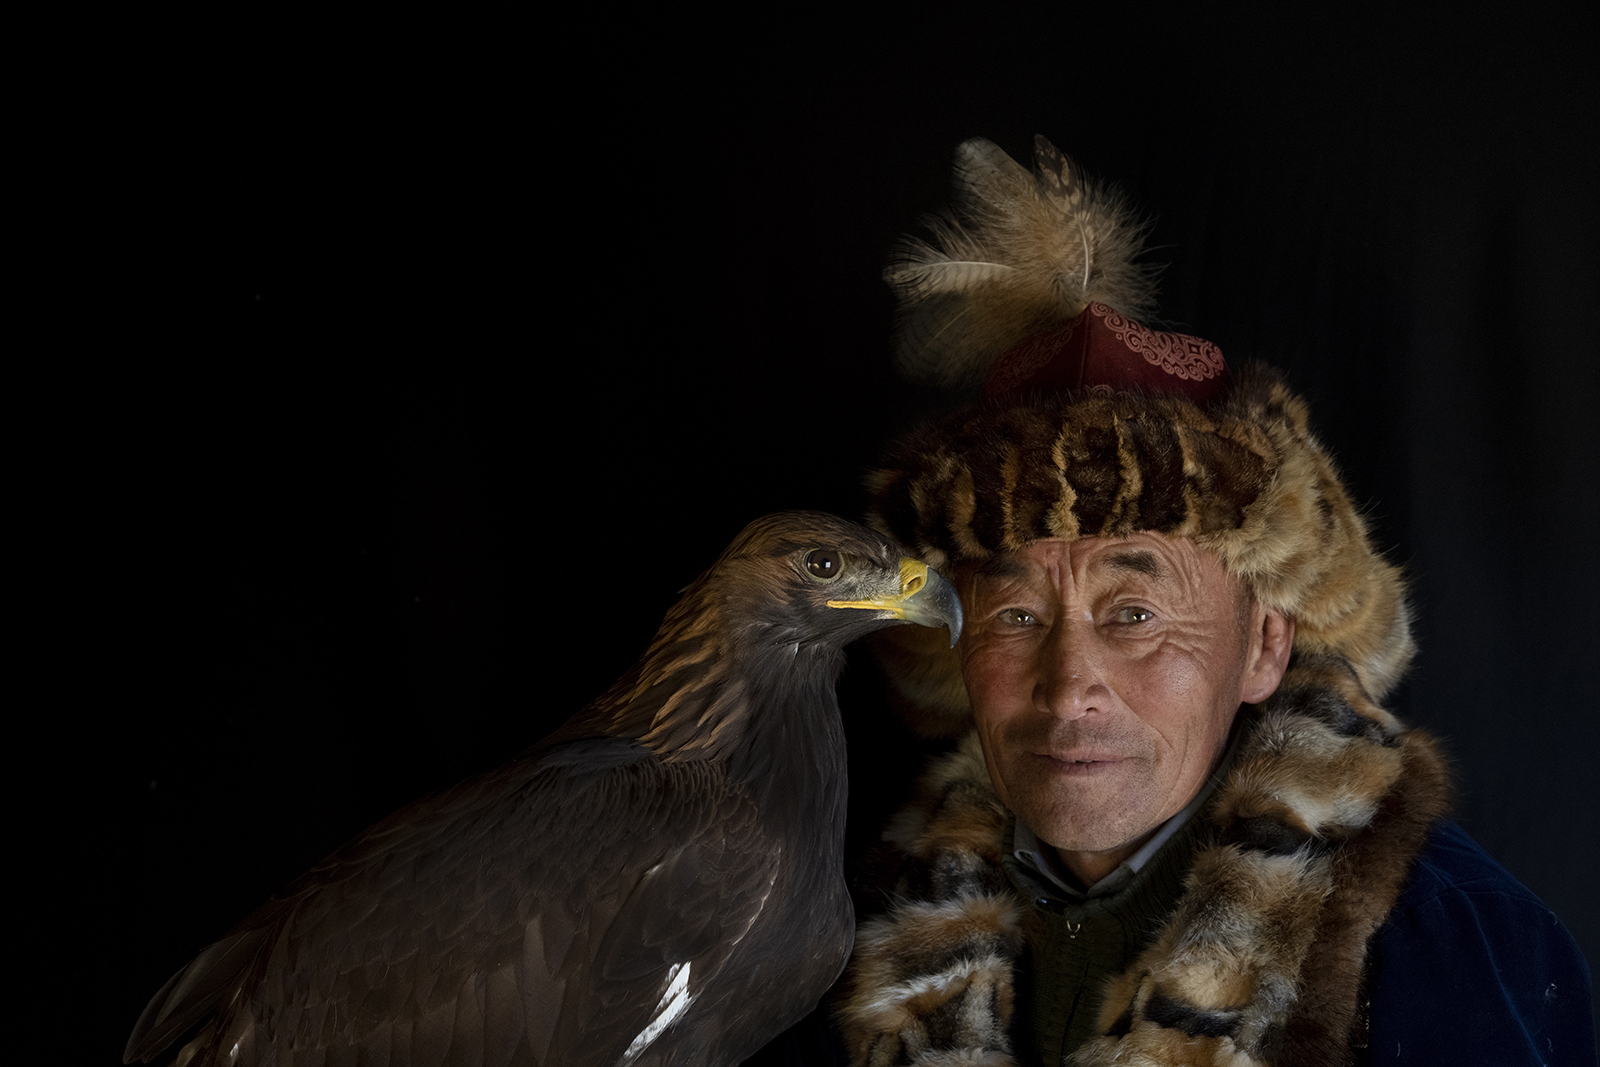 eagle+hunter+portrait.jpg